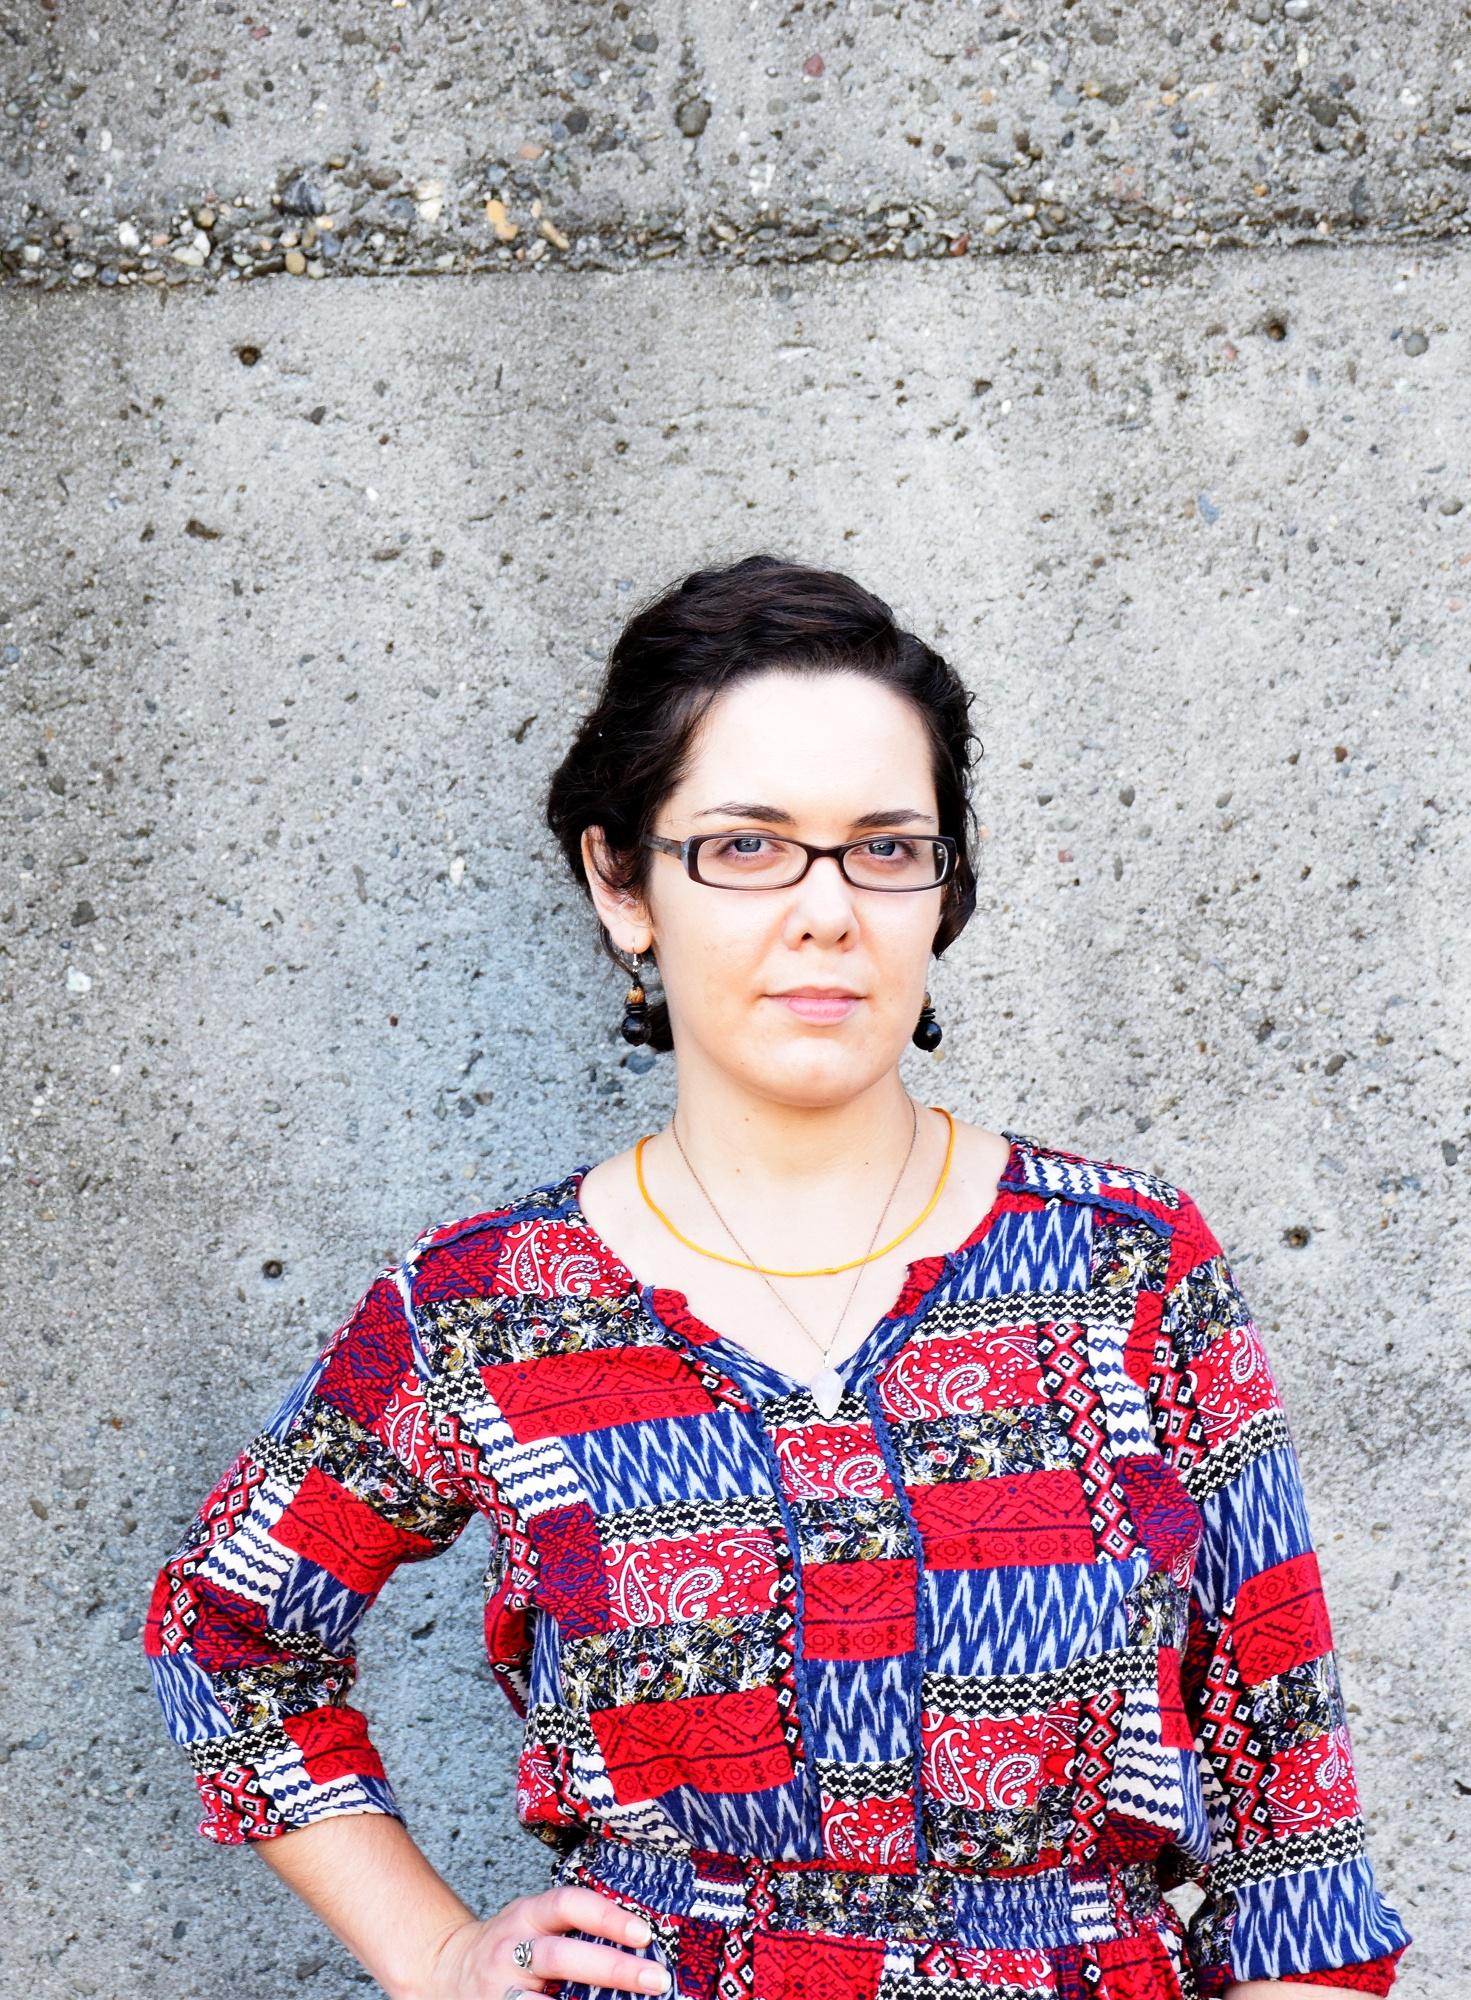 Portrait-Veramendi-2017-web